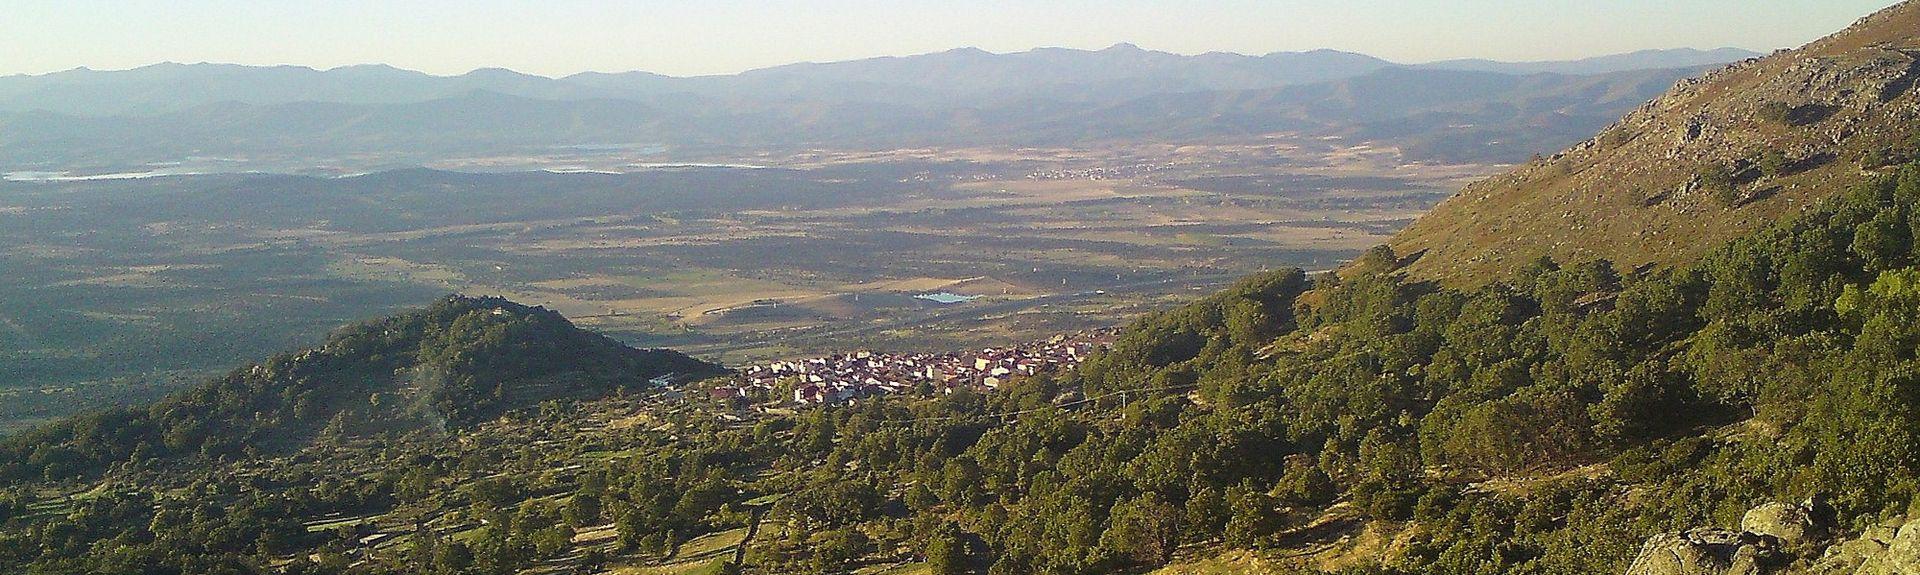 Casas del Castañar, Extremadura, Spanien